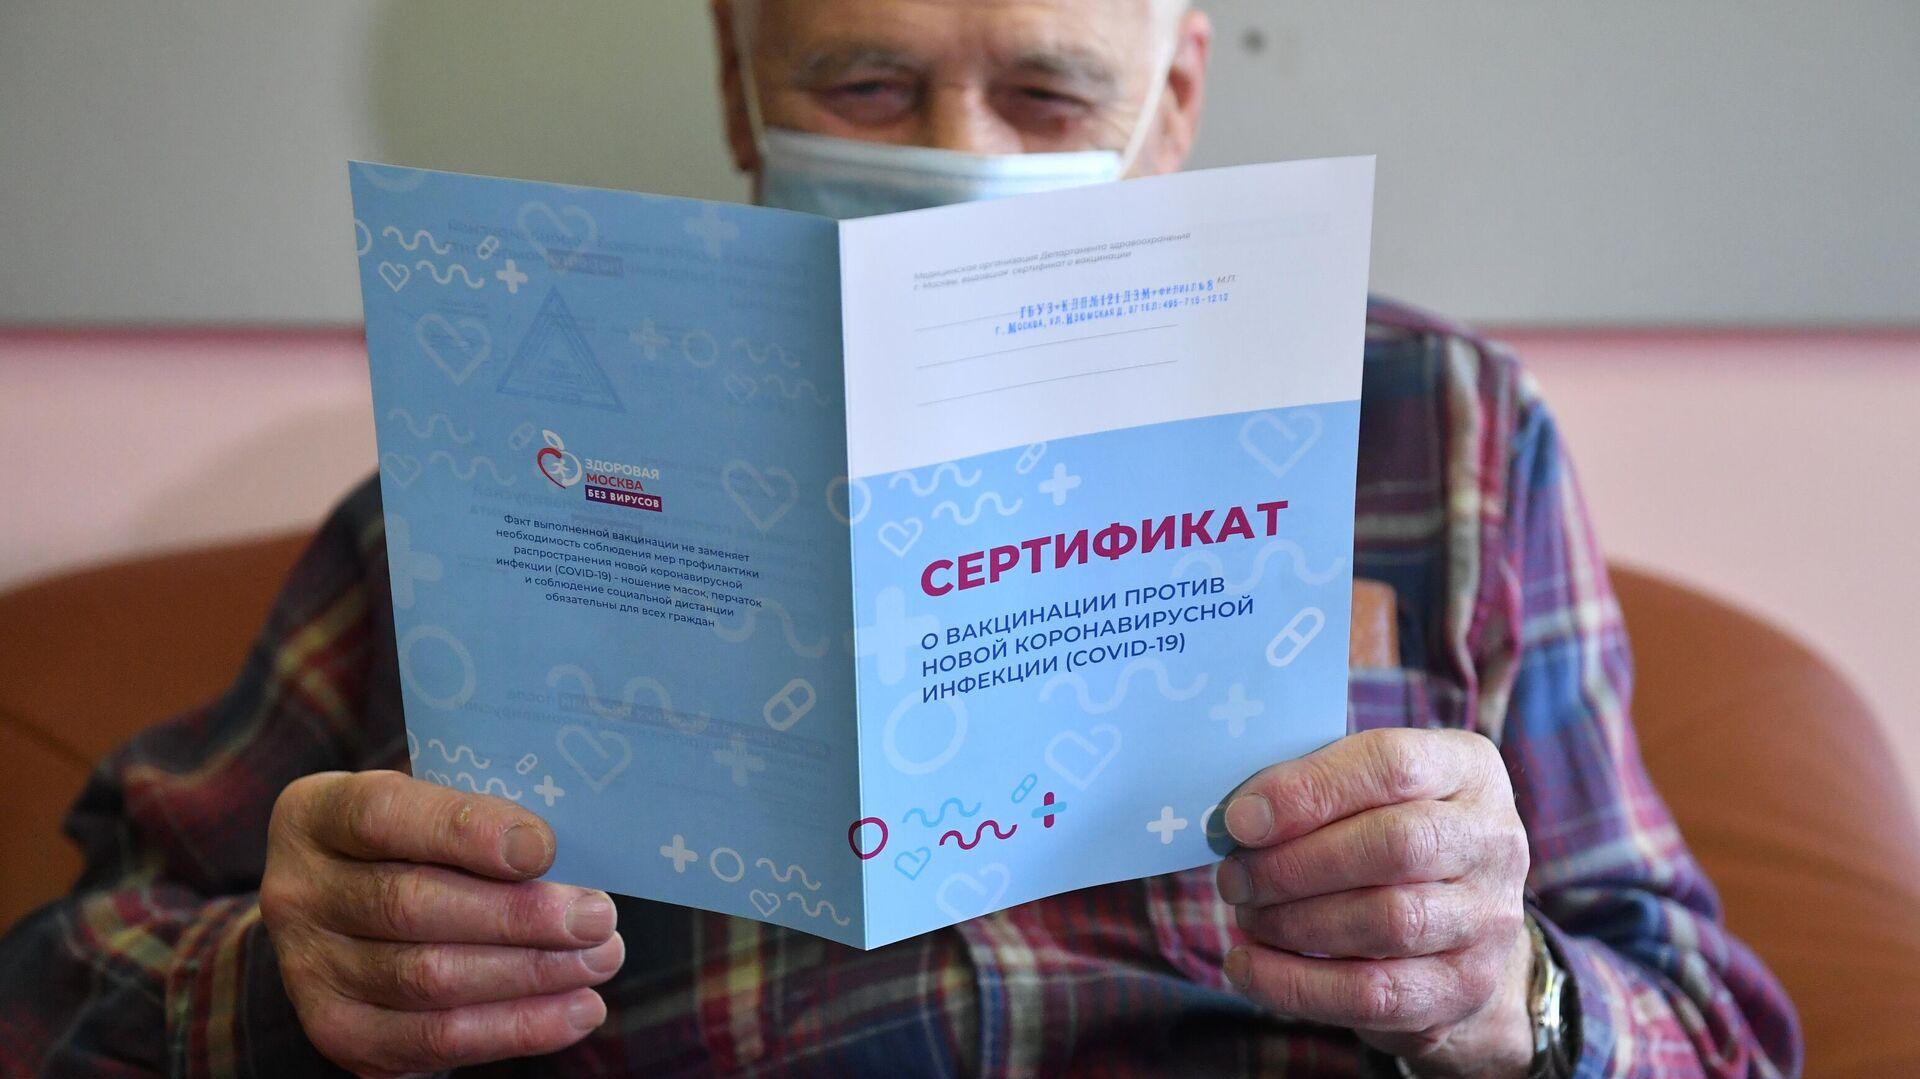 Мужчина держит в руках сертификат о вакцинации против коронавирусной инфекции (COVID-19) - РИА Новости, 1920, 31.12.2020